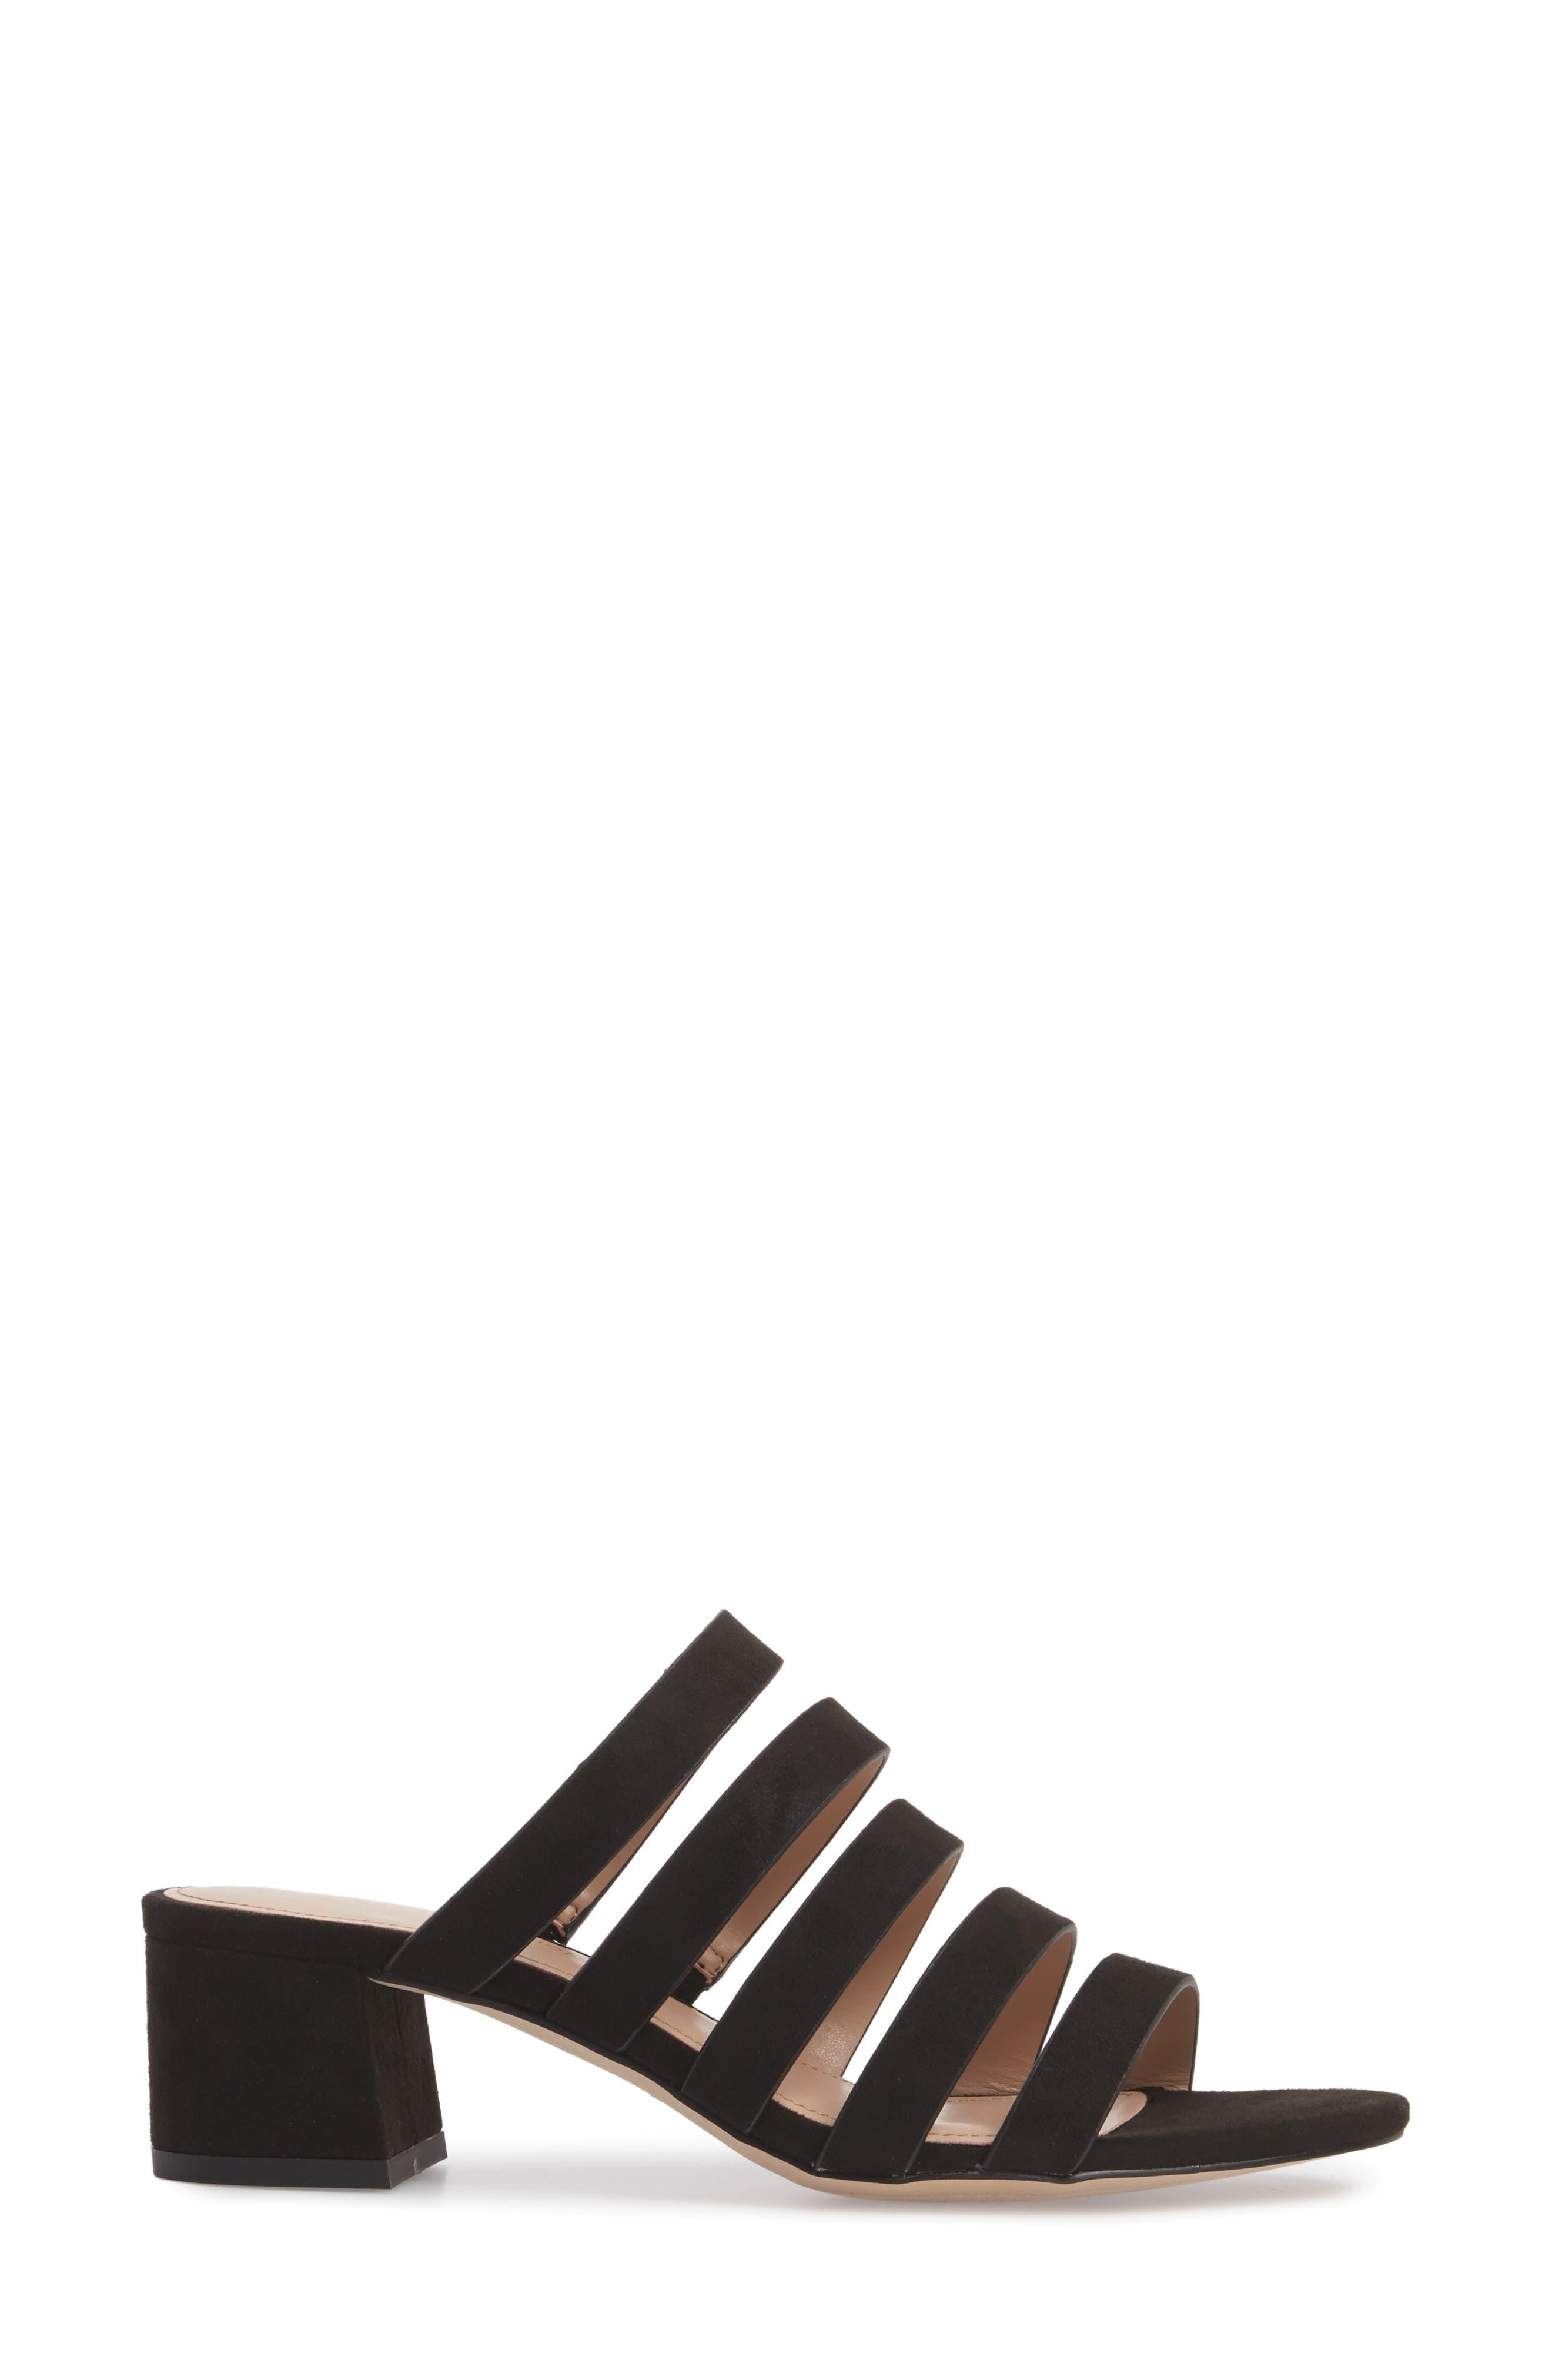 Frankie Slide Sandal,                             Alternate thumbnail 3, color,                             Black Micro Suede